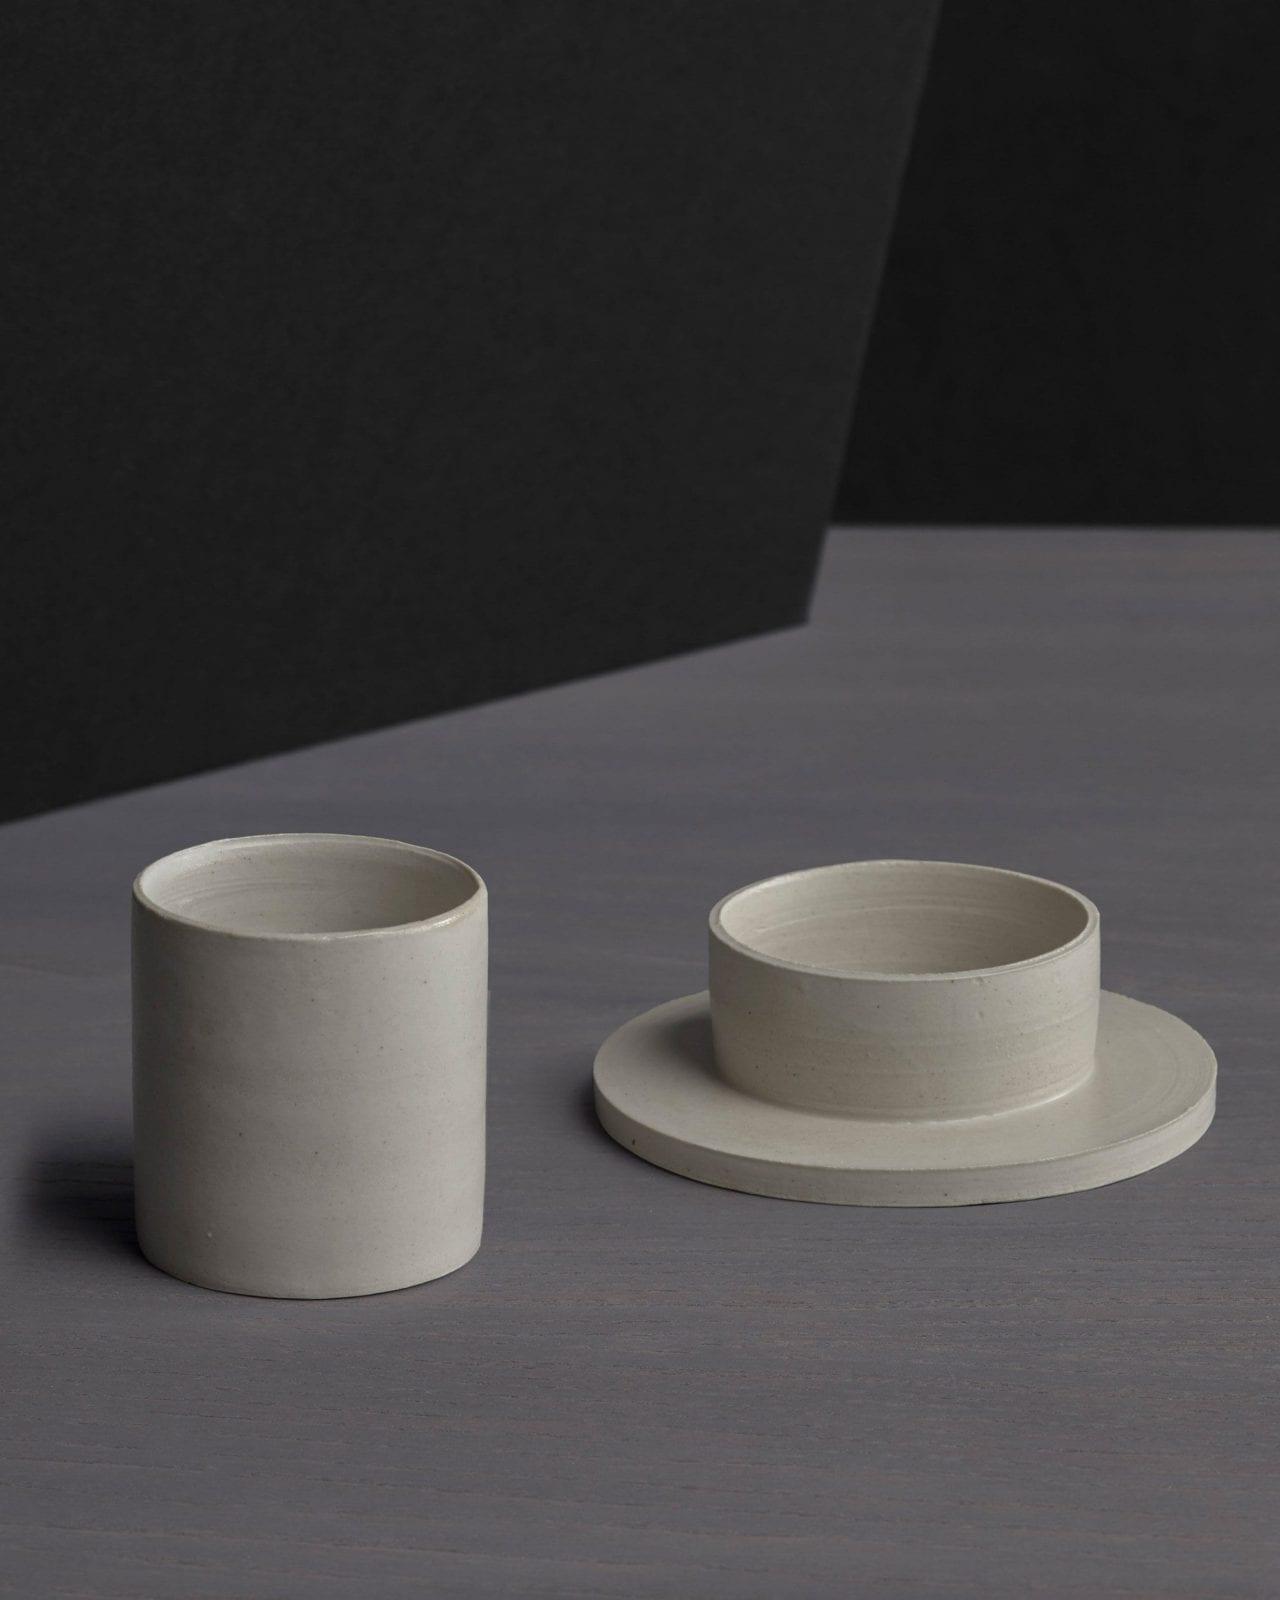 Society Limonta Coffee Cup — Tazzina — Bianco